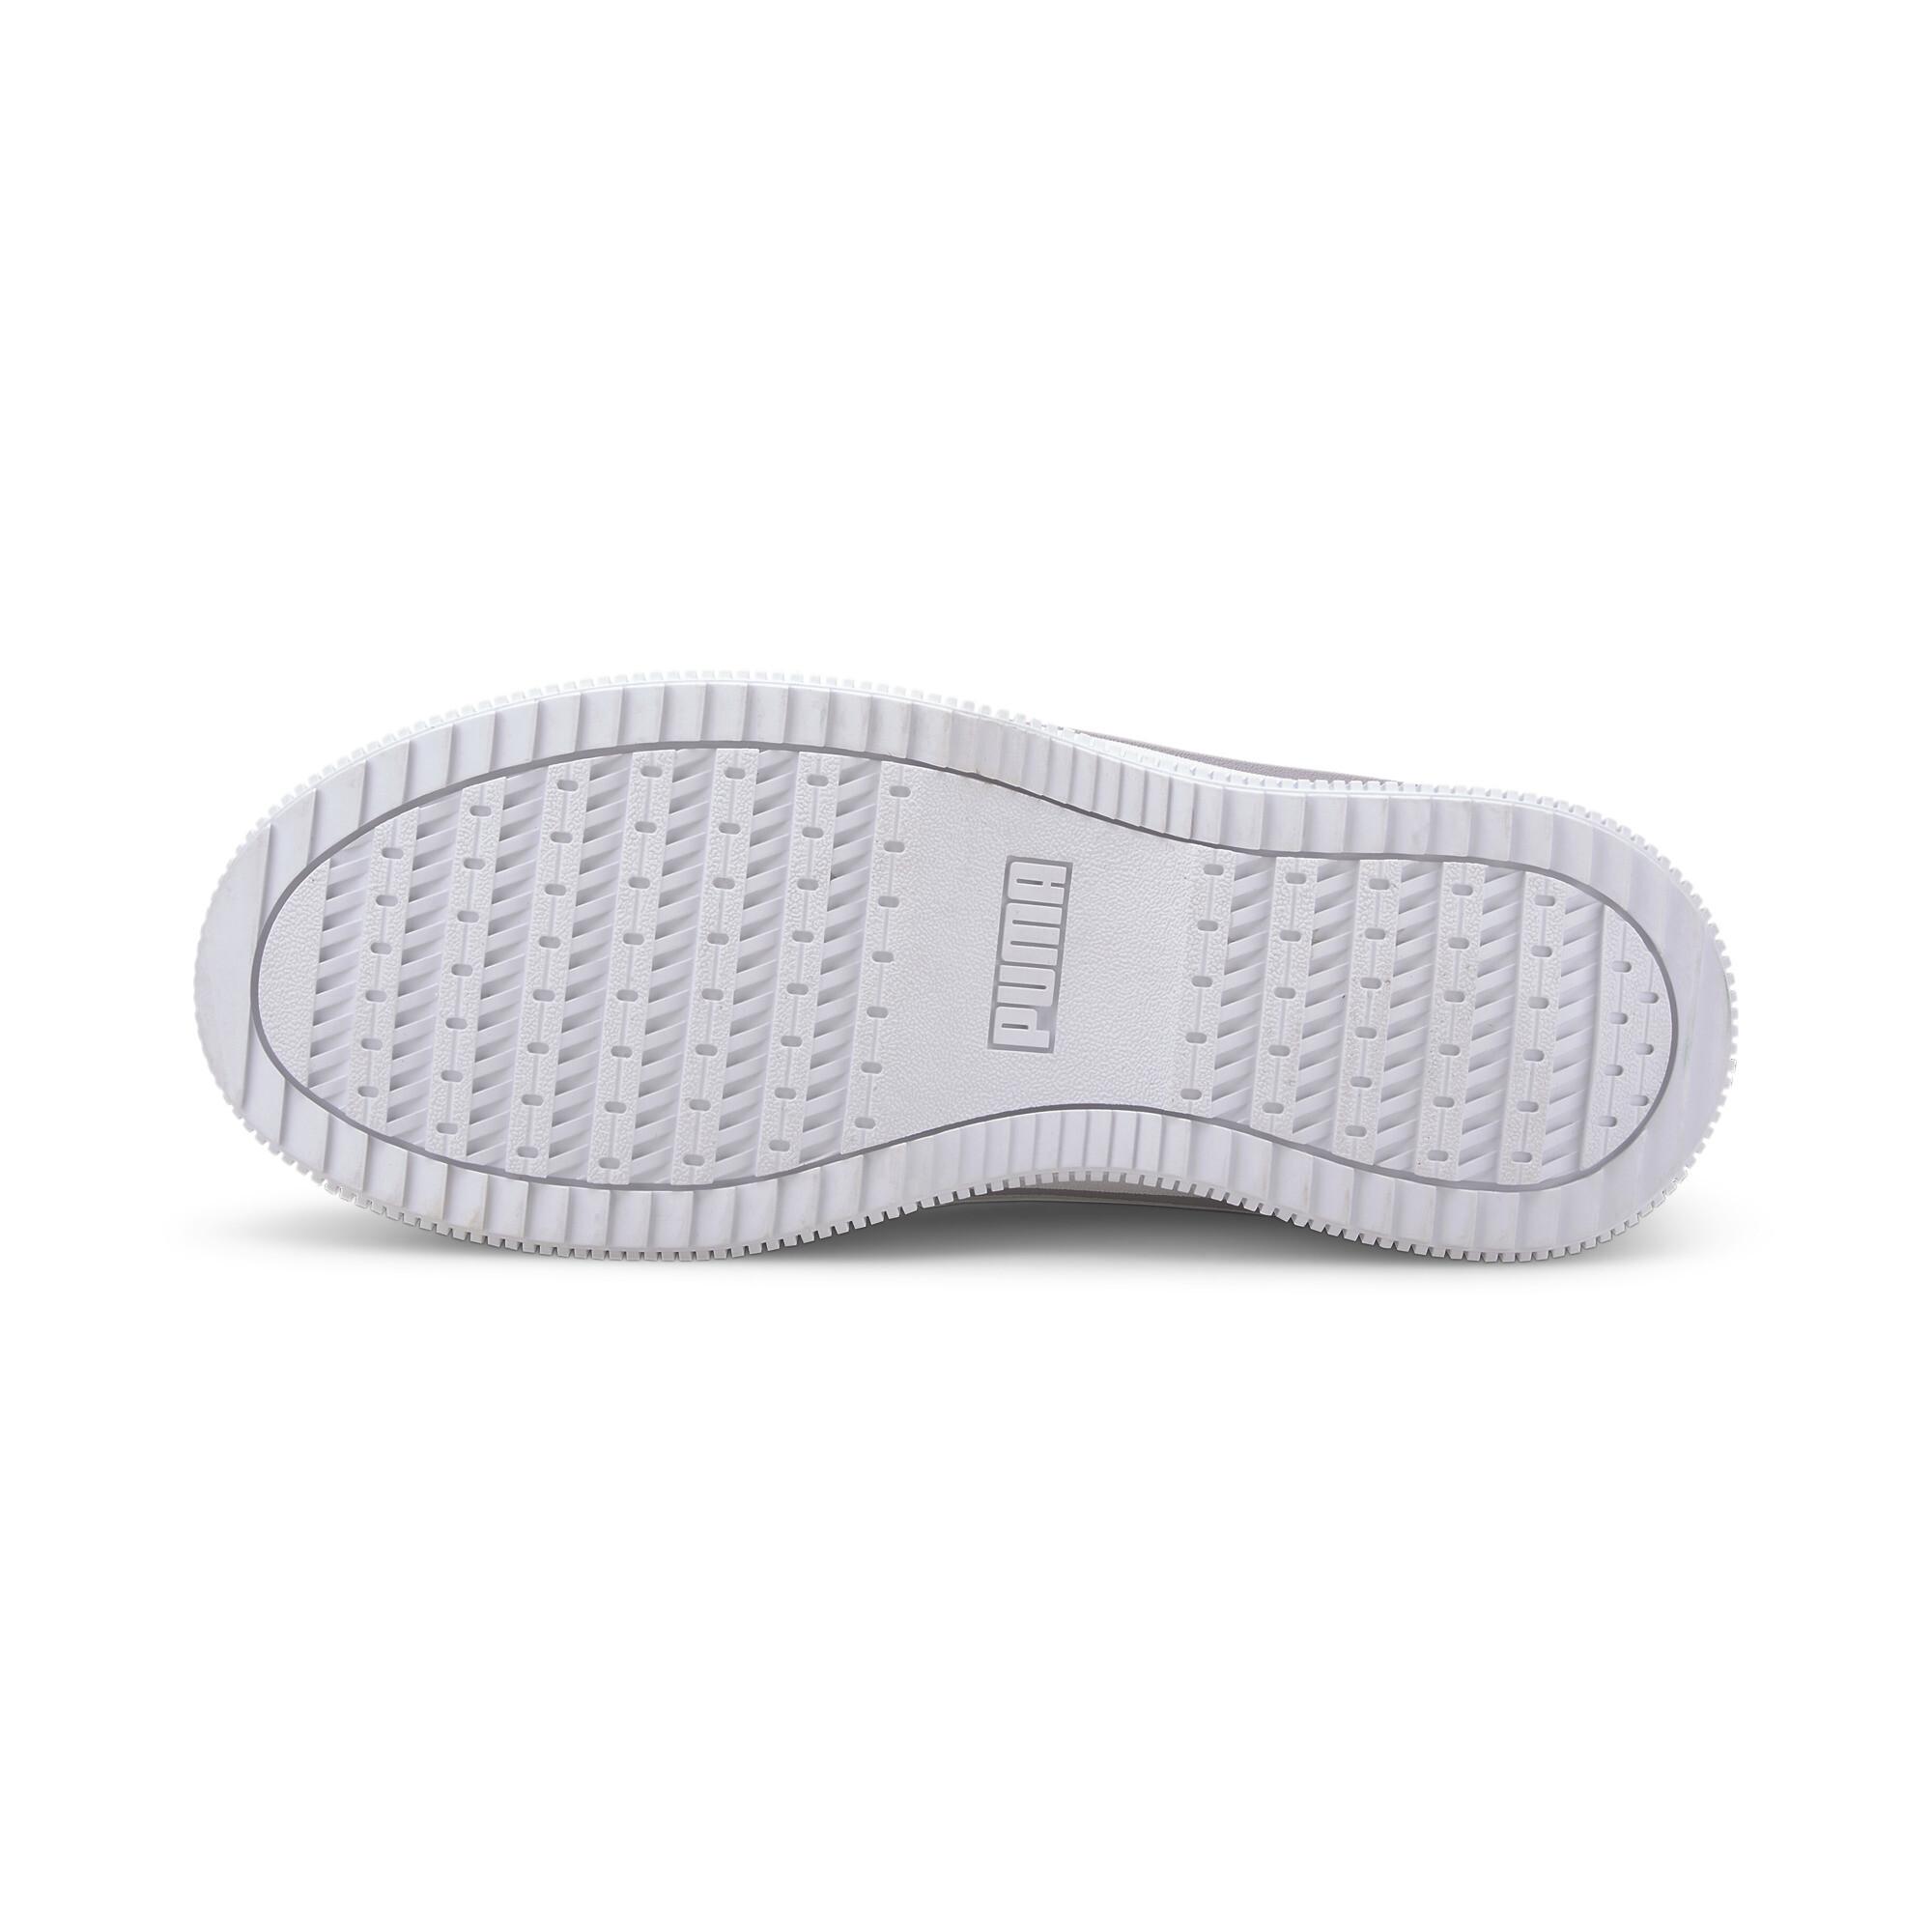 PUMA-Women-039-s-DEVA-Suede-Sneakers thumbnail 20